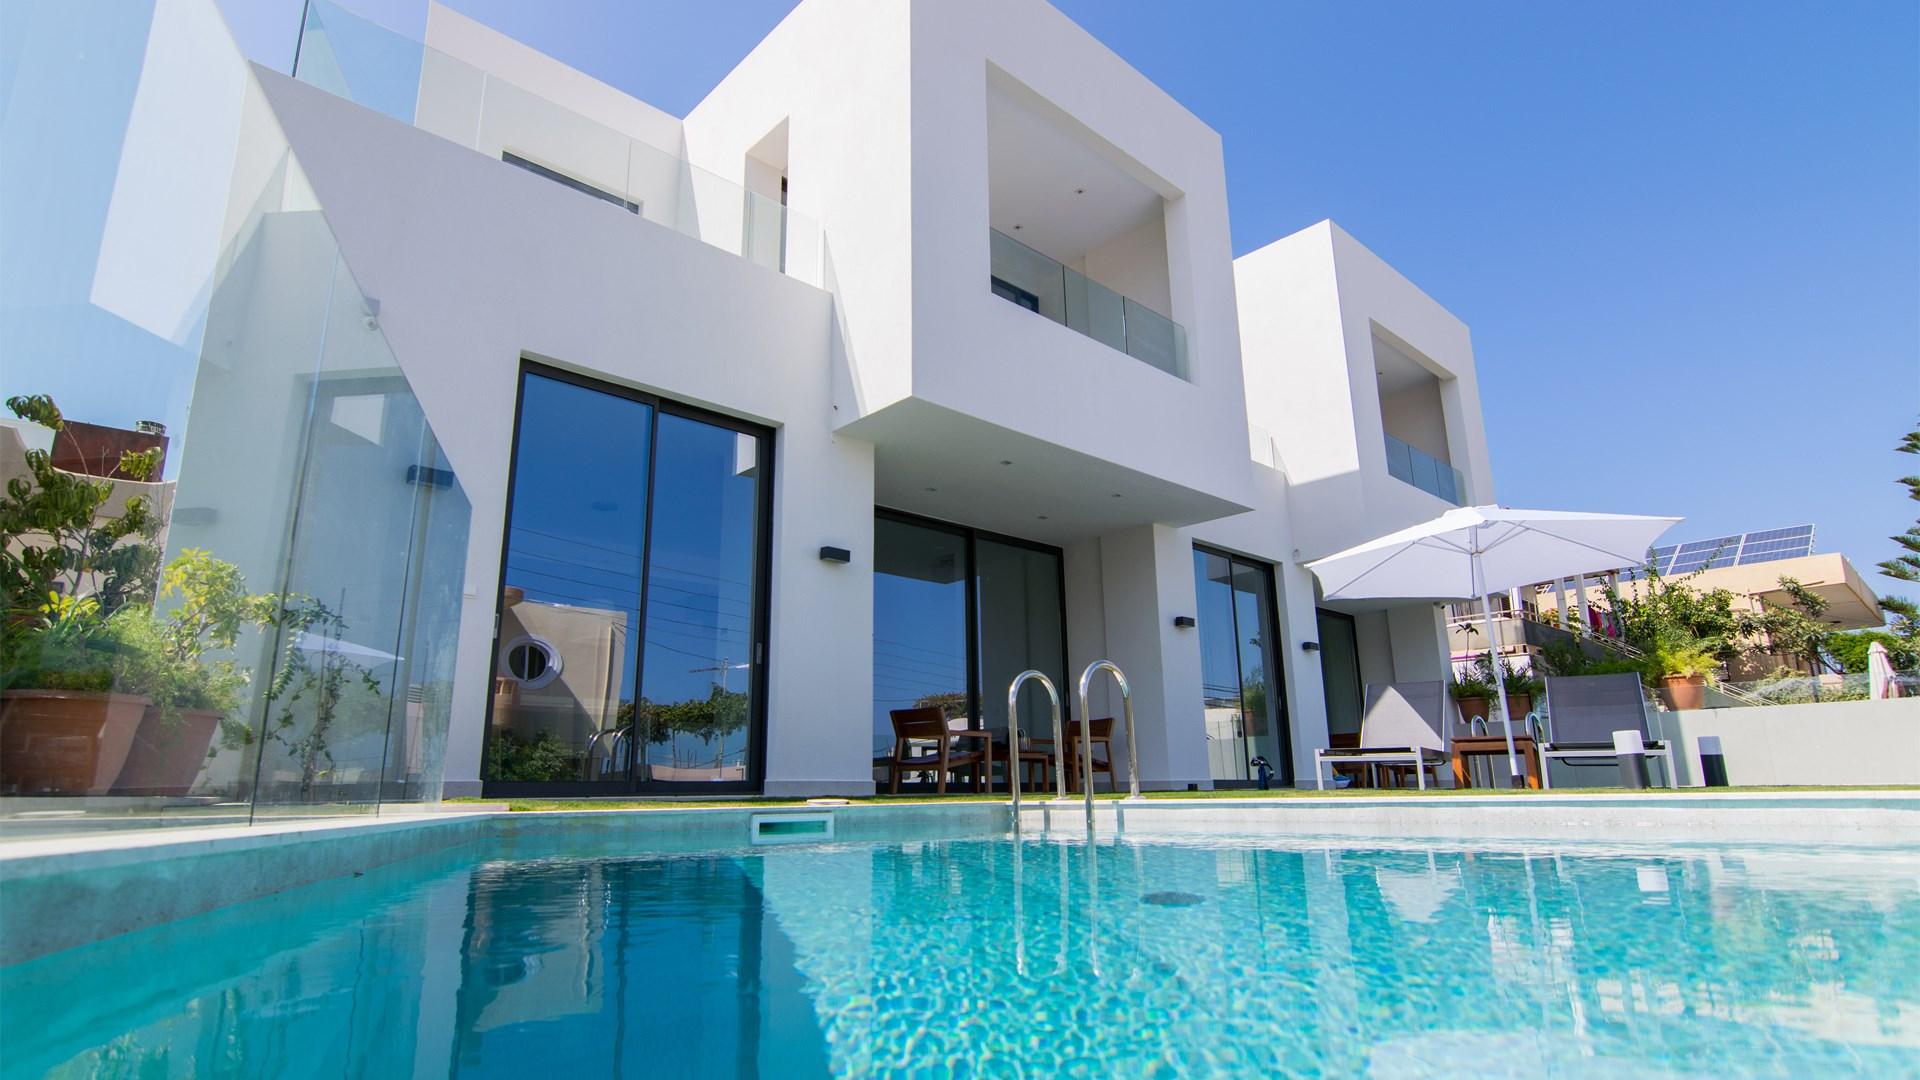 sandk villas kalamaki beach chania crete greece. Black Bedroom Furniture Sets. Home Design Ideas